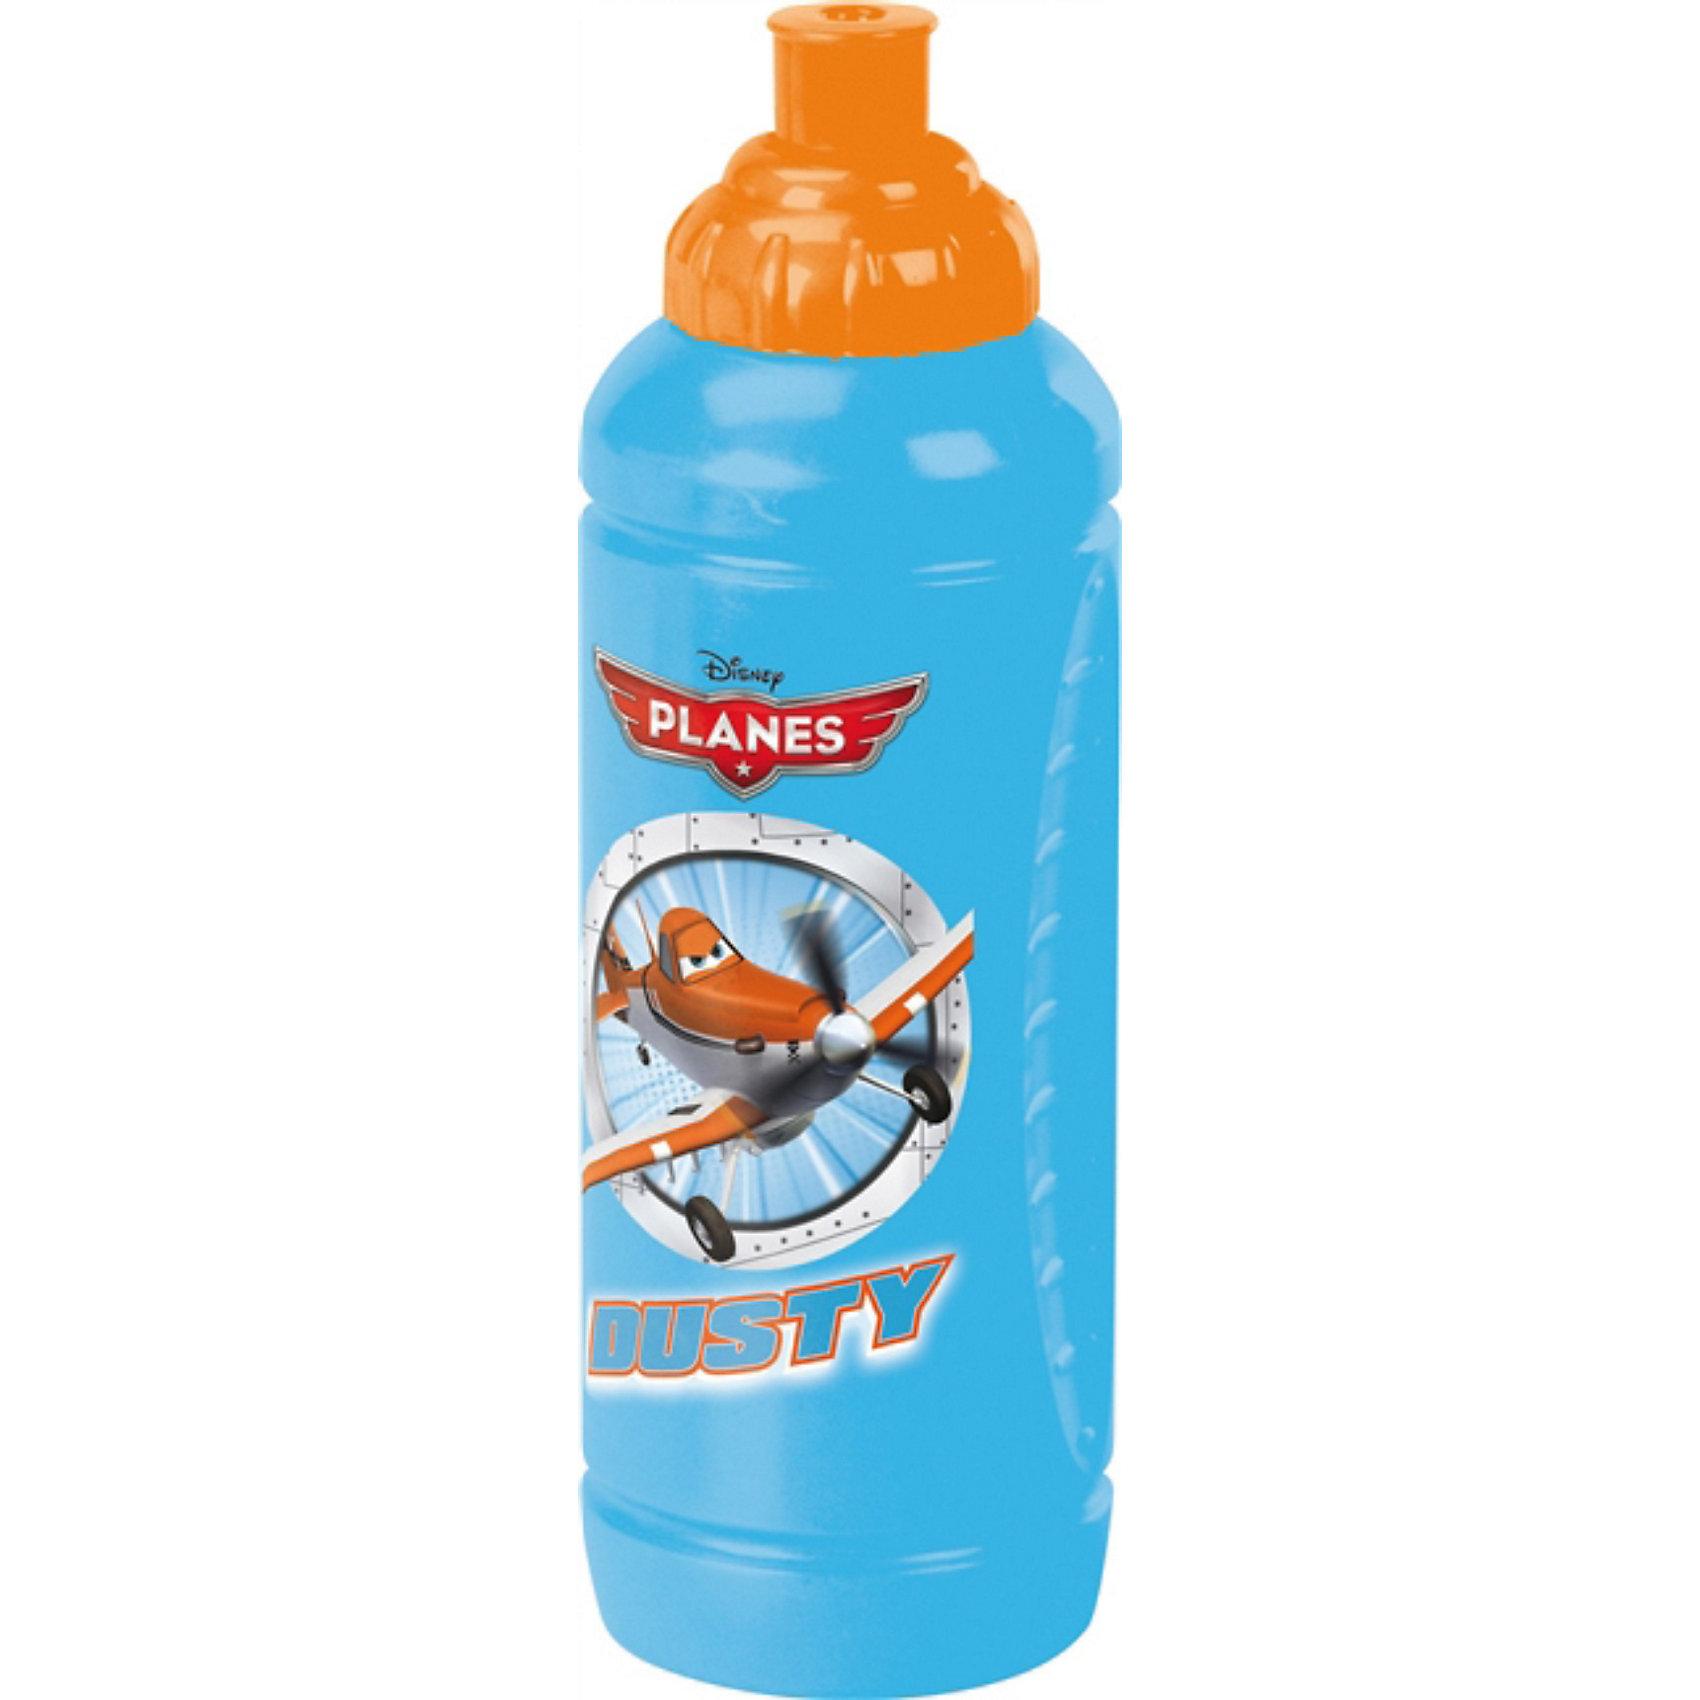 Новый Диск Бутылка спортивная (425 мл), Самолеты бутылка спортивная 700 мл чёрная 1104075